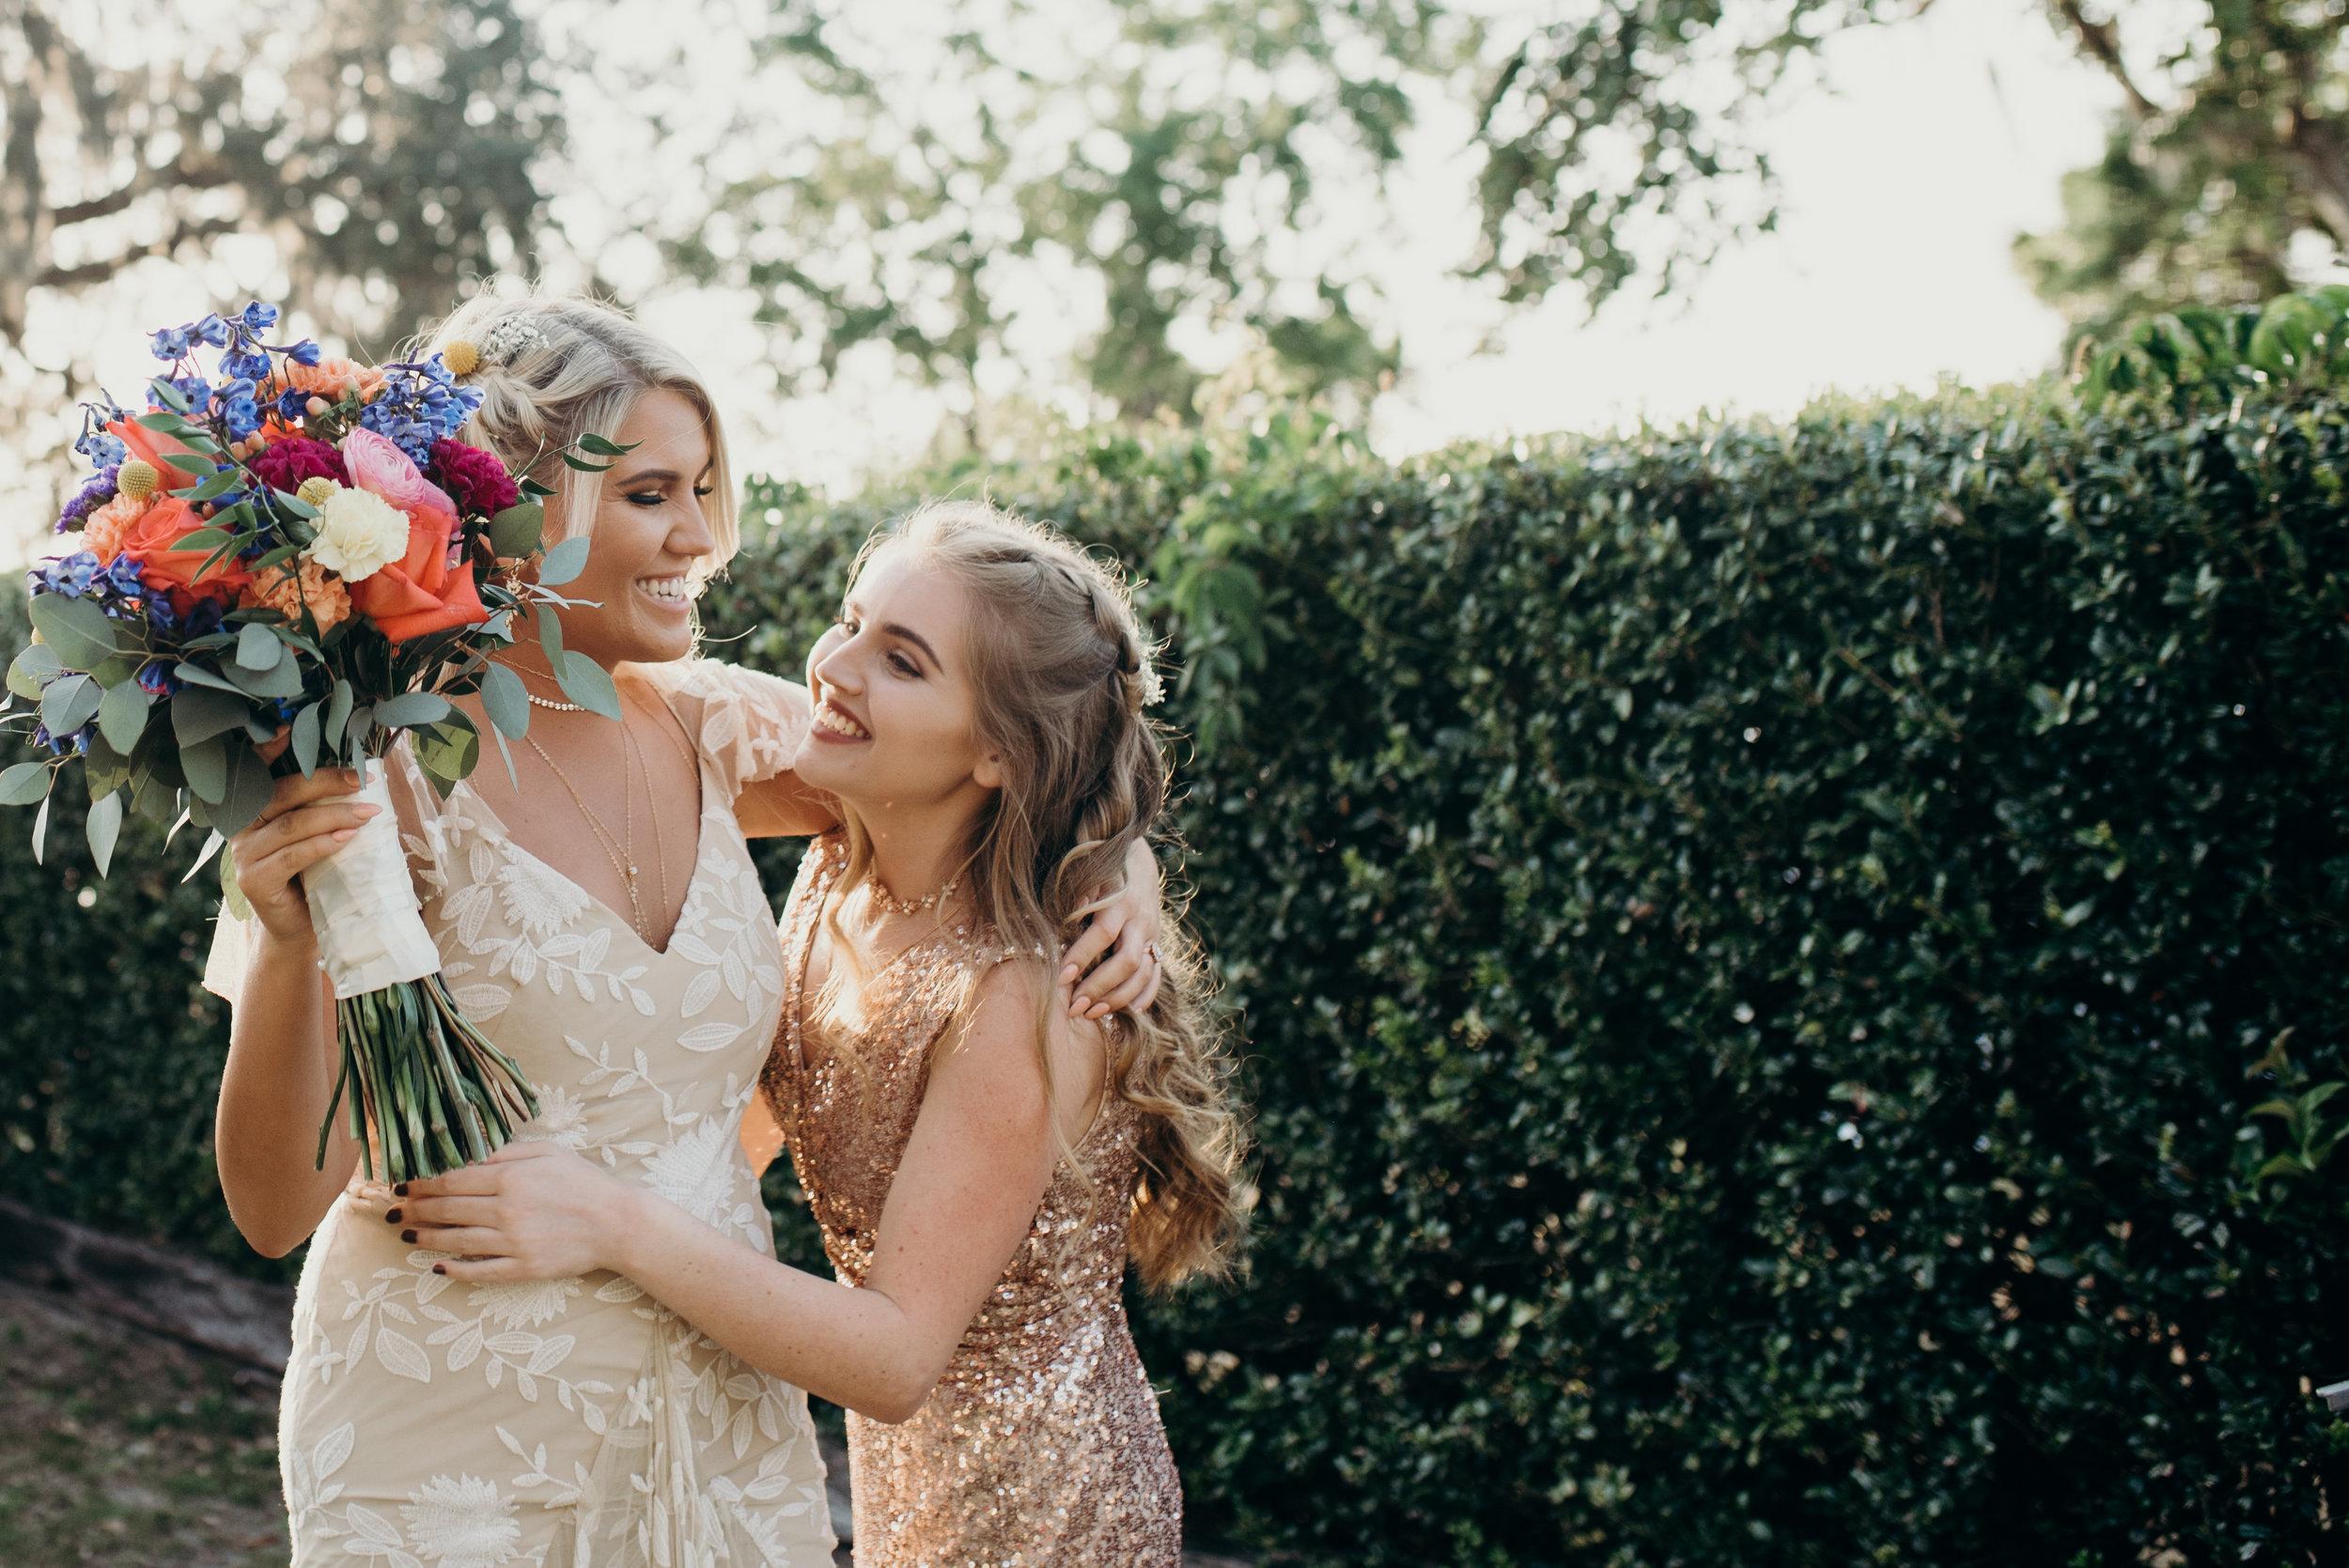 zayda-collin-panama-city-wedding-photography-trippy-bohemian-lisa-frank-wedding-ceremony-169.jpg